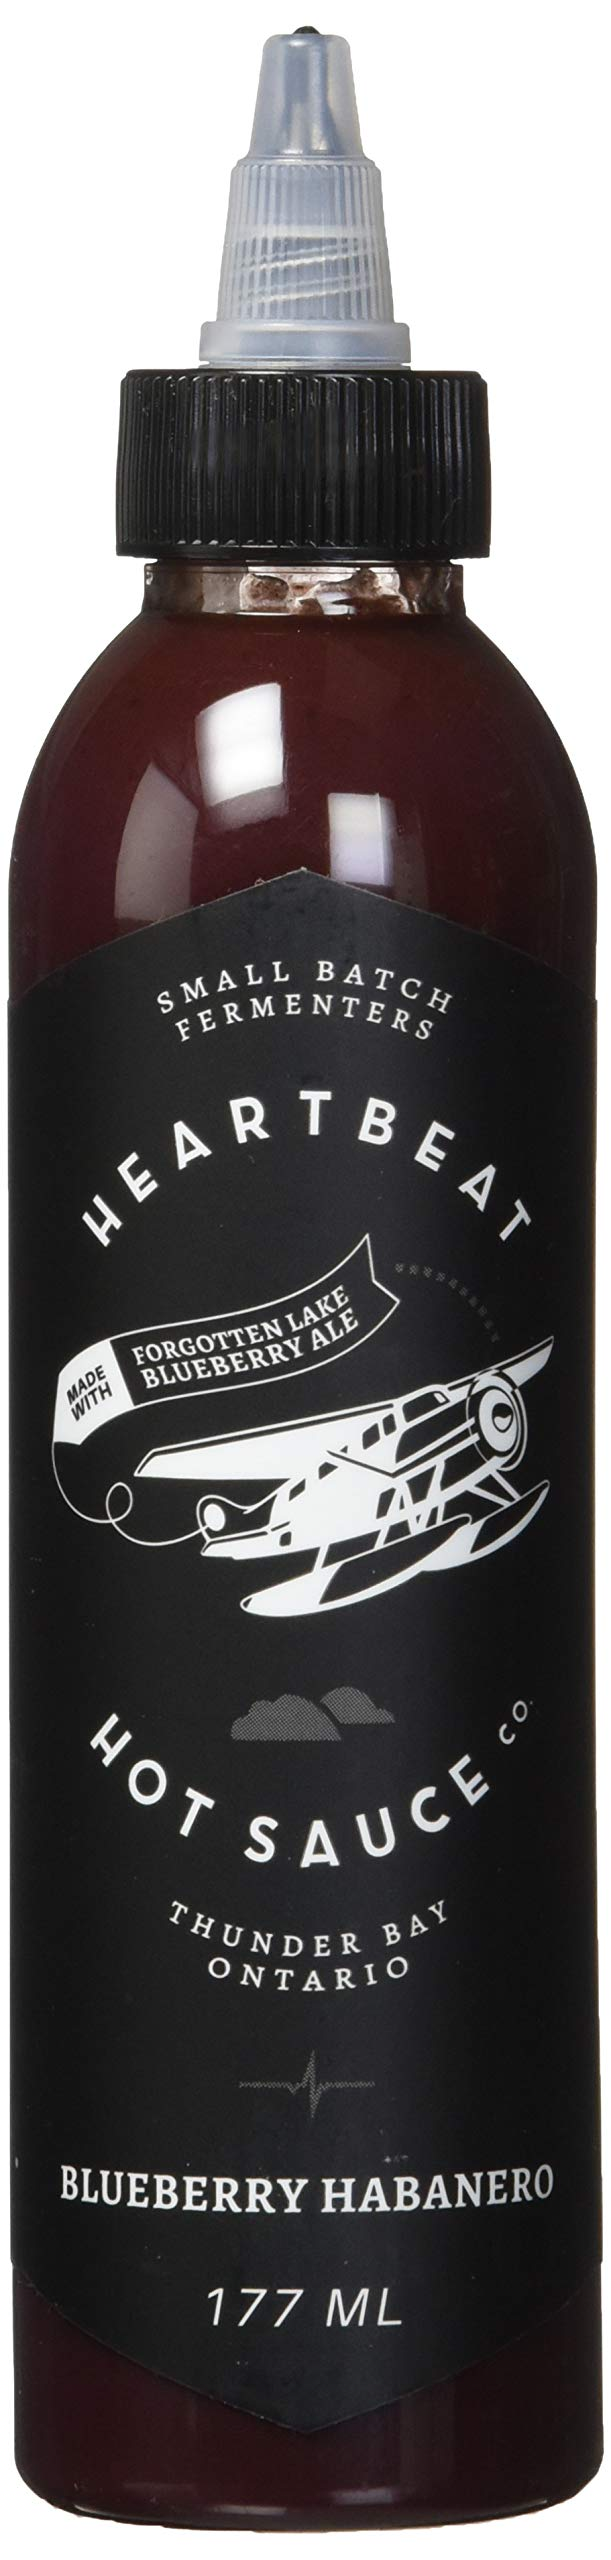 Heartbeat Hot Sauce - Blueberry Habanero